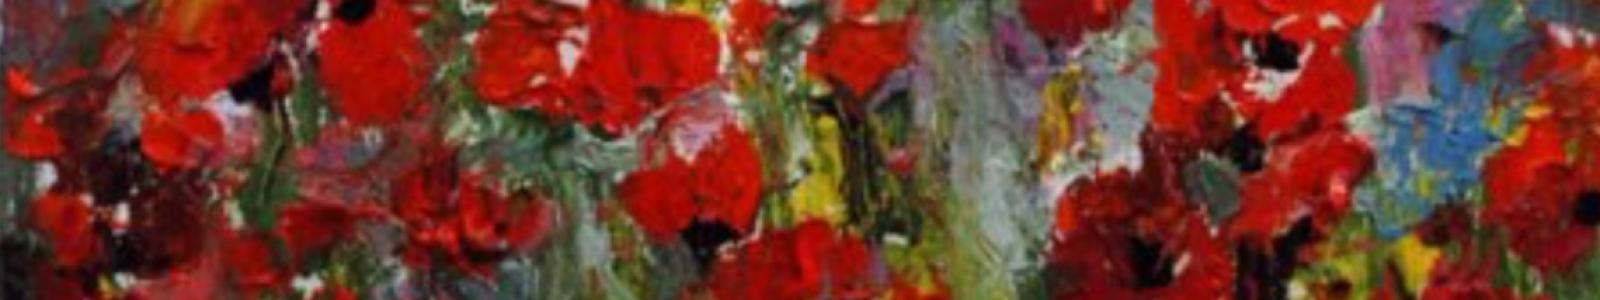 Gallery Painter Viktoria Korotaeva